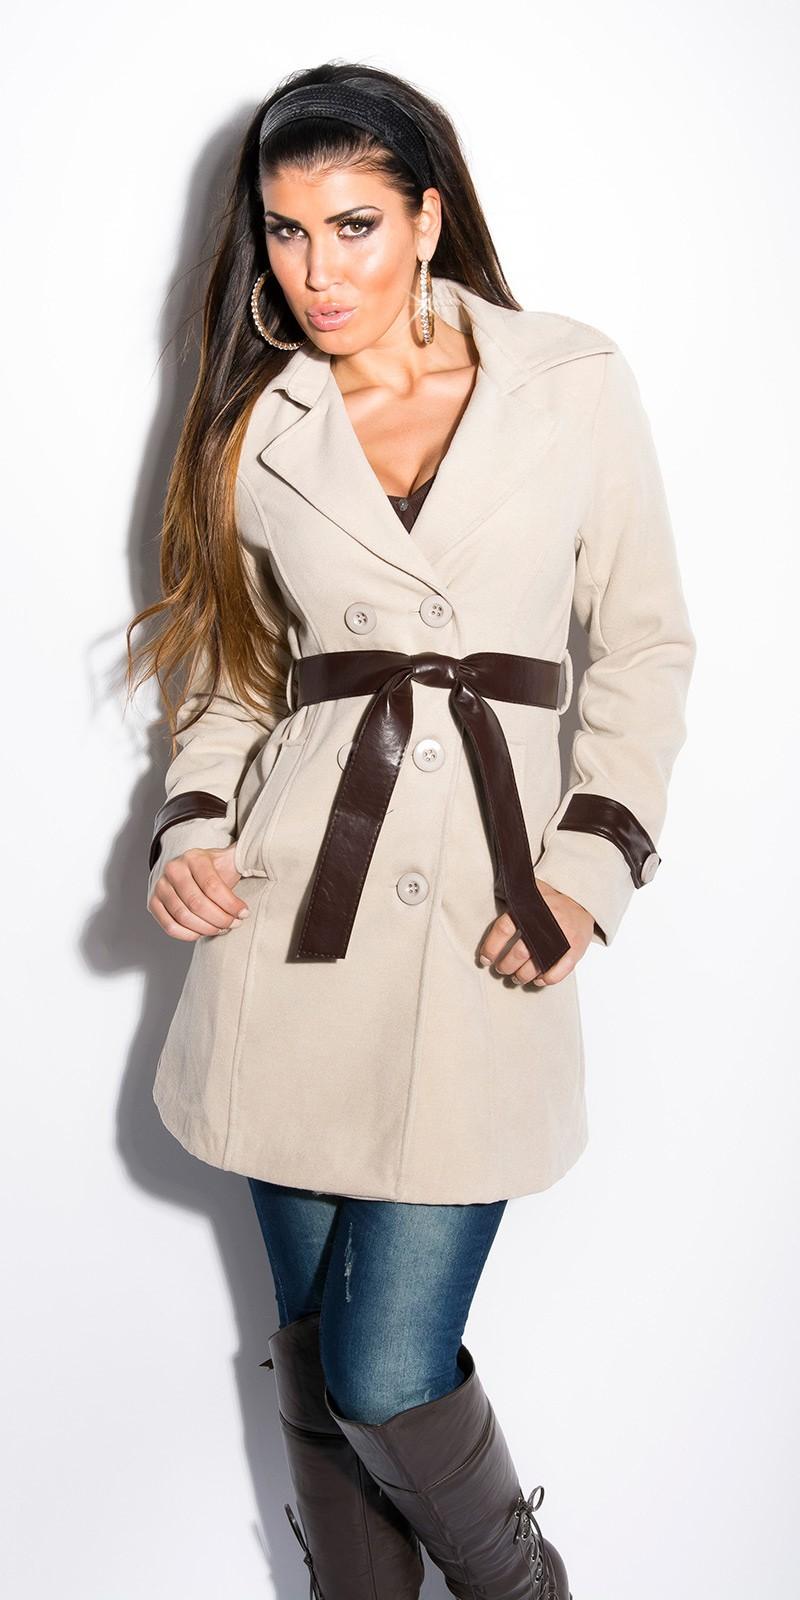 cf50183689 Béžový dámský kabát s páskem